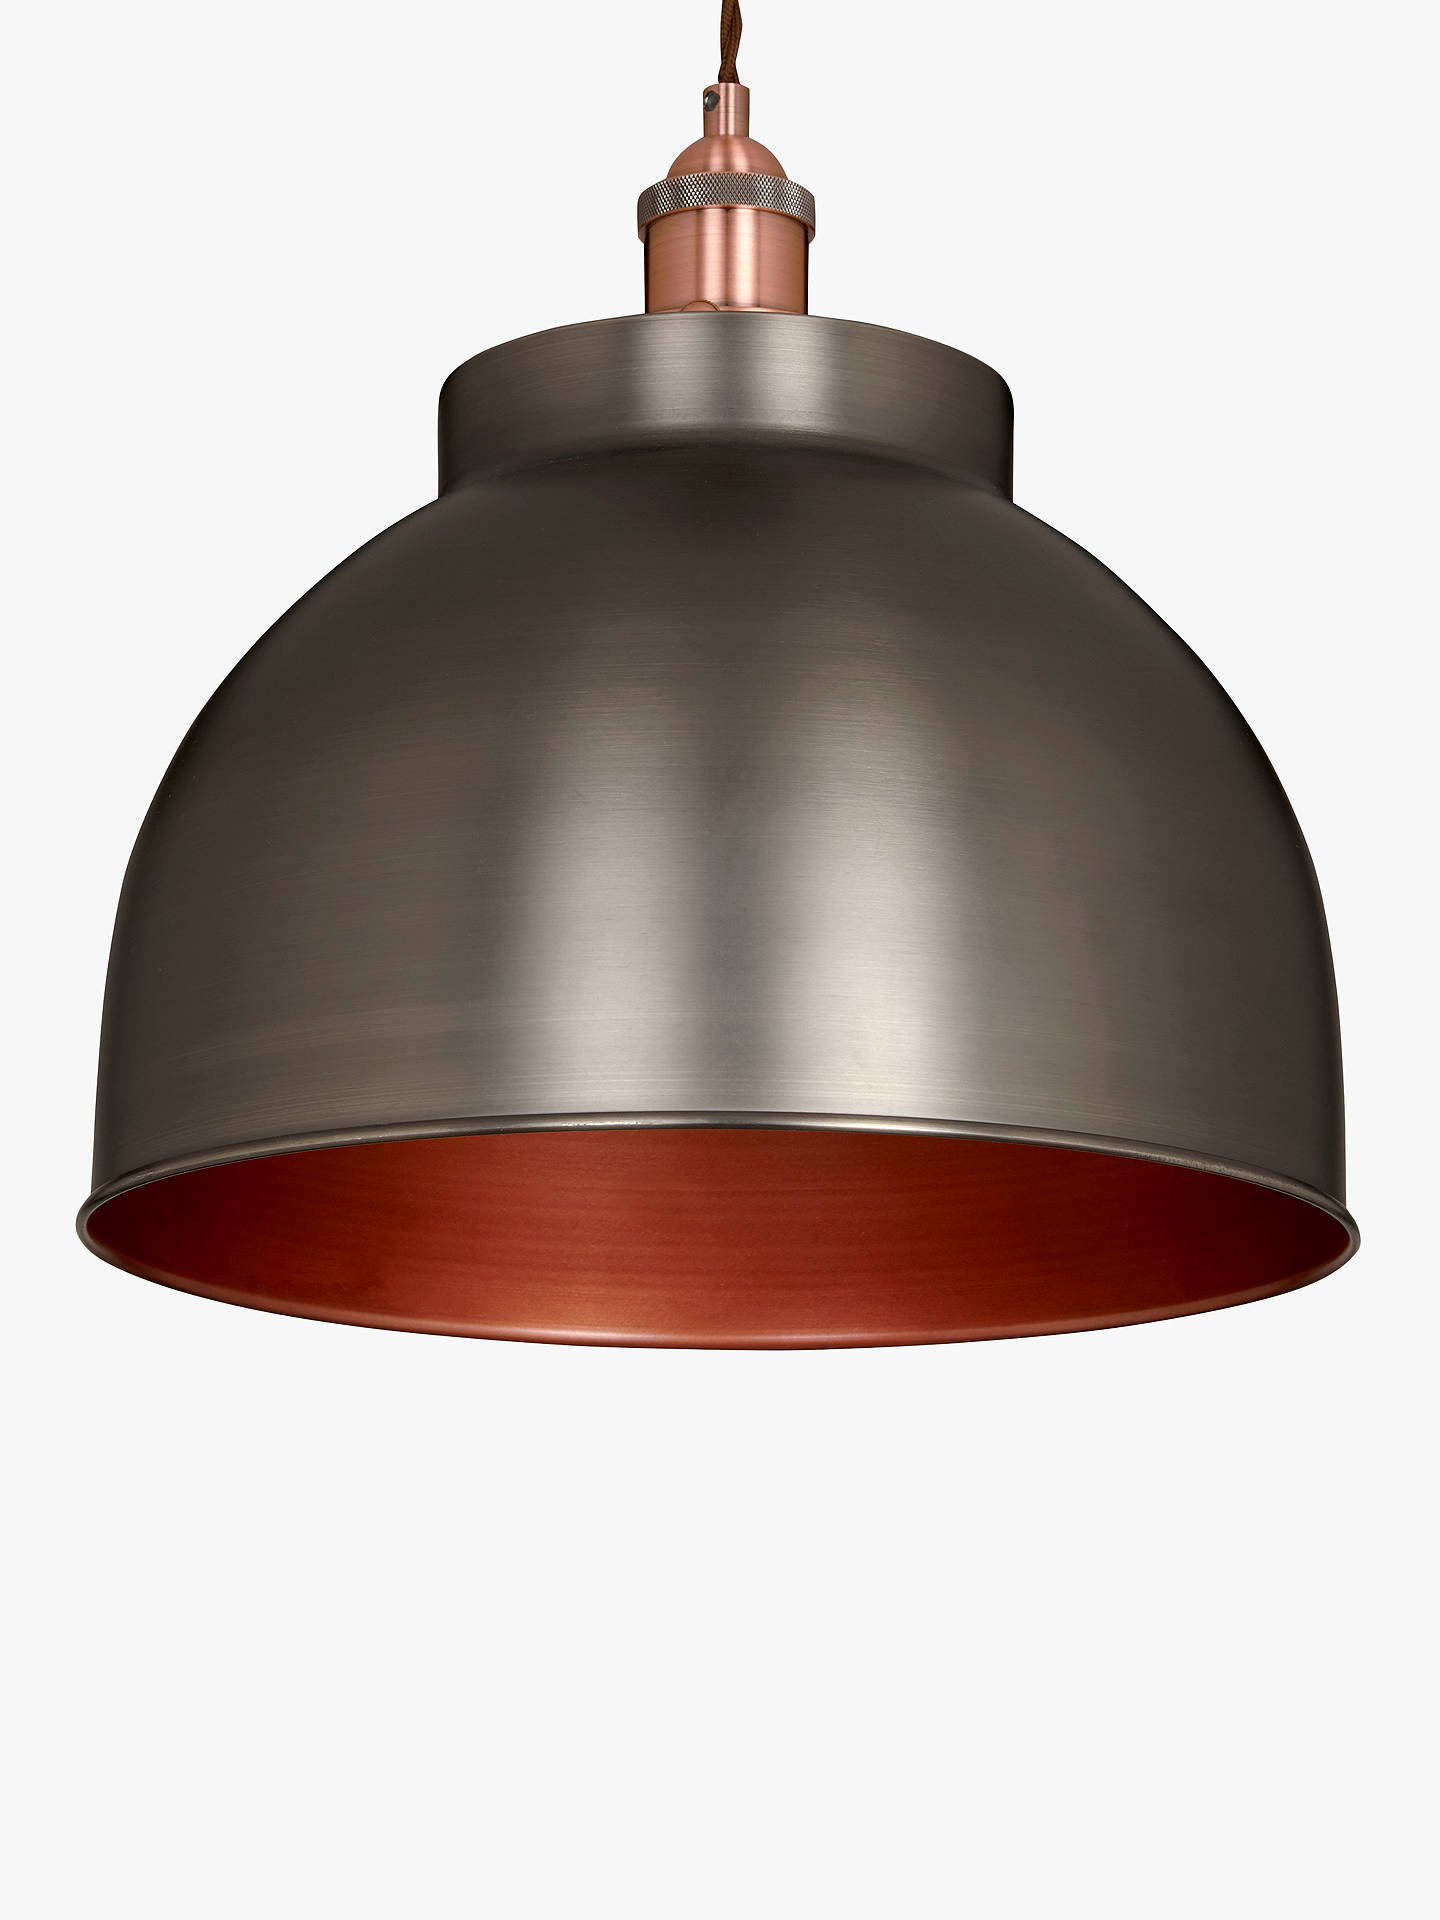 John Lewis Amp Partners Baldwin Large Pendant Ceiling Light